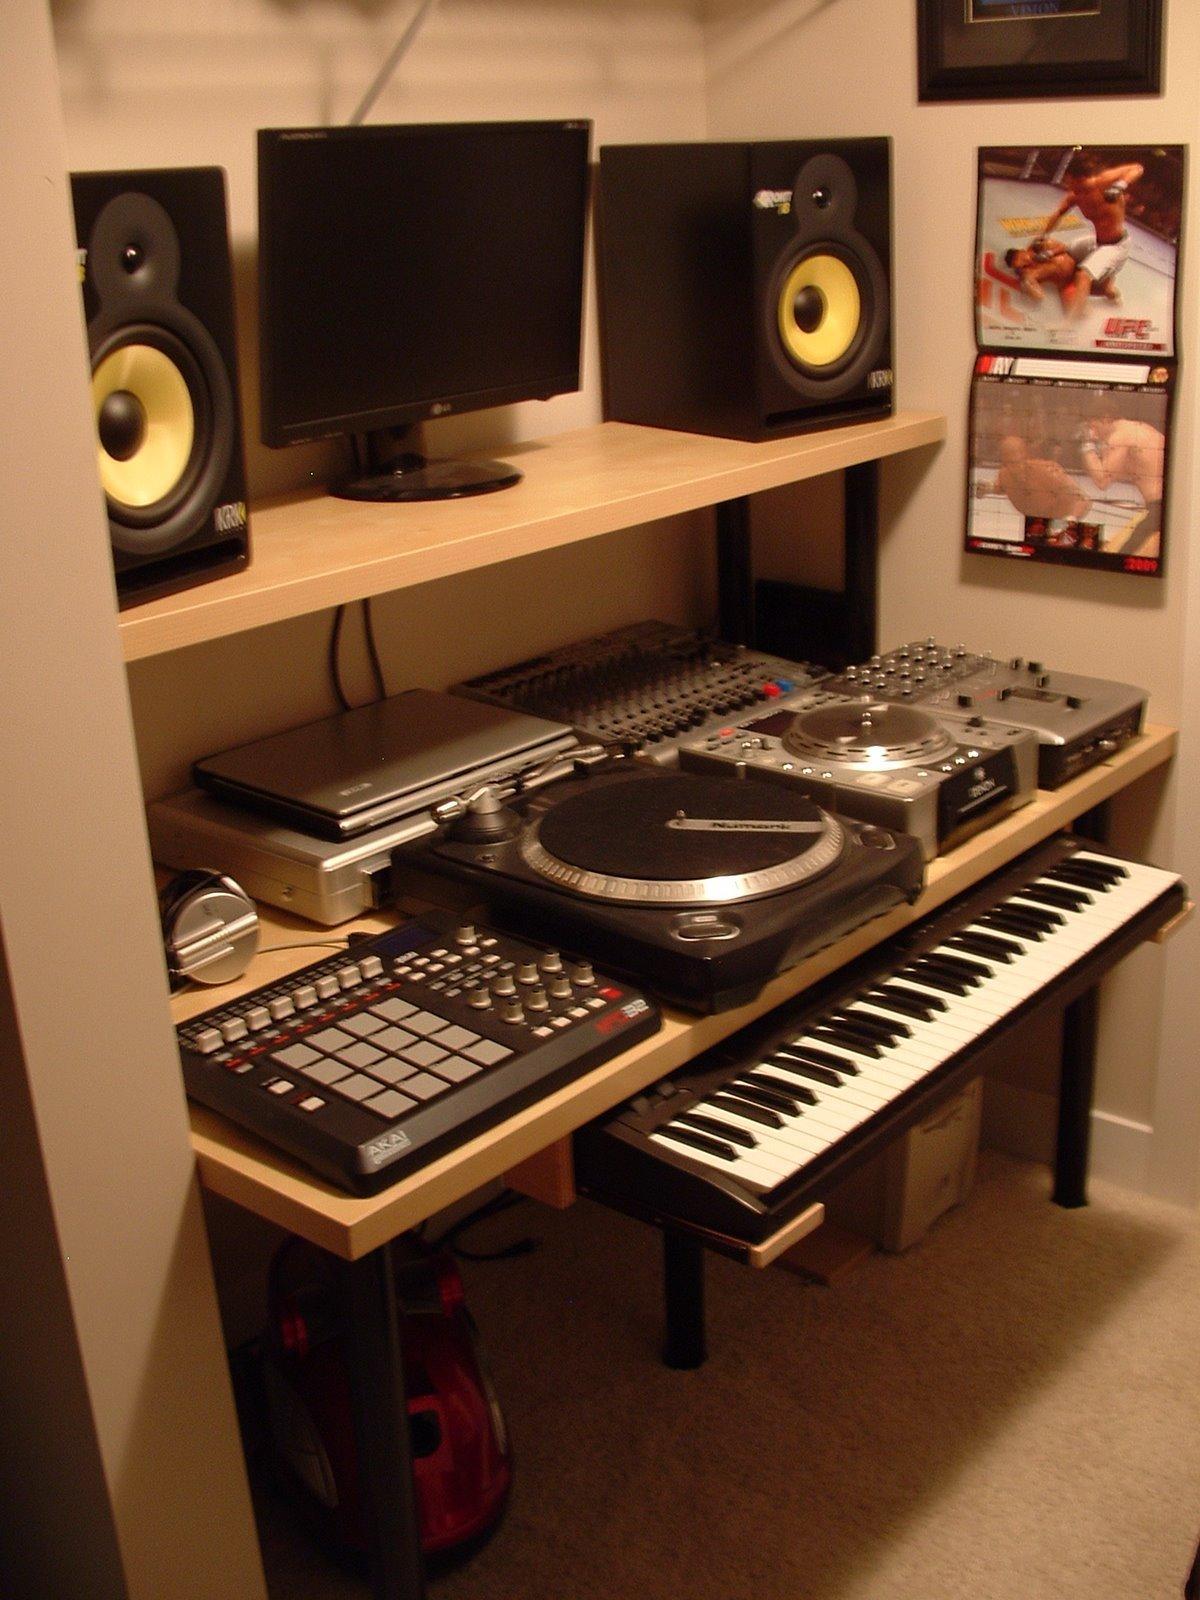 Http Www Ikeahackers Net 2009 06 Compact Music Studio Html